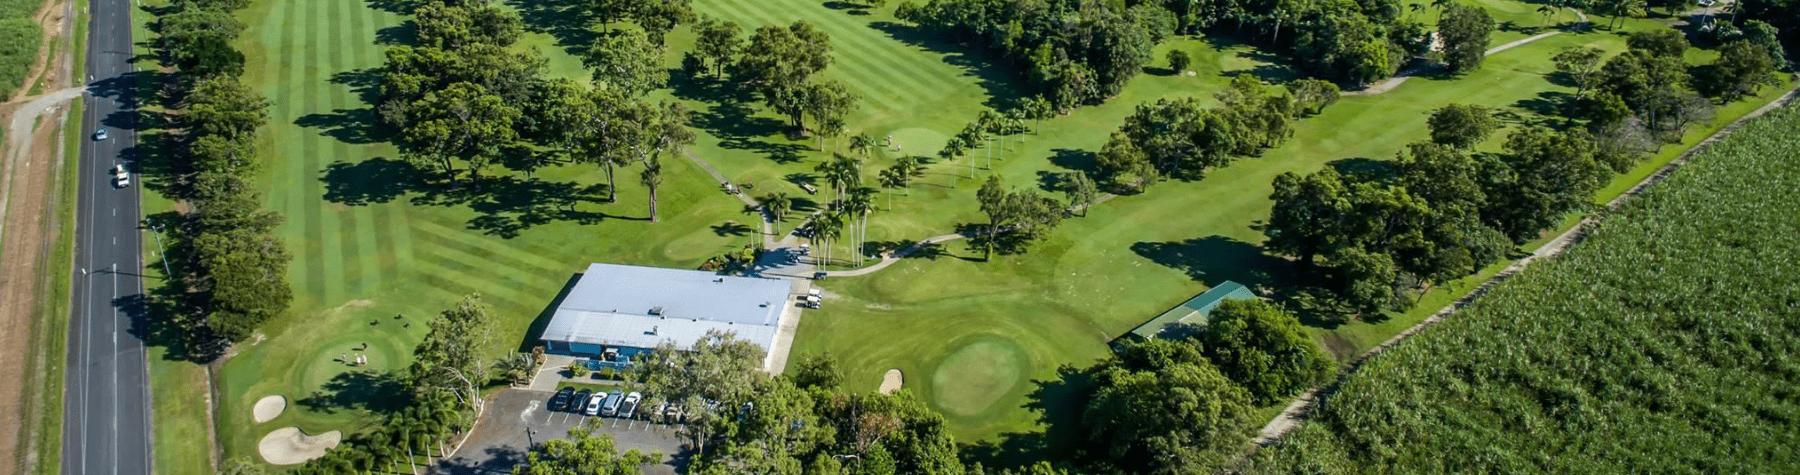 Council tees off on Mossman Golf Club